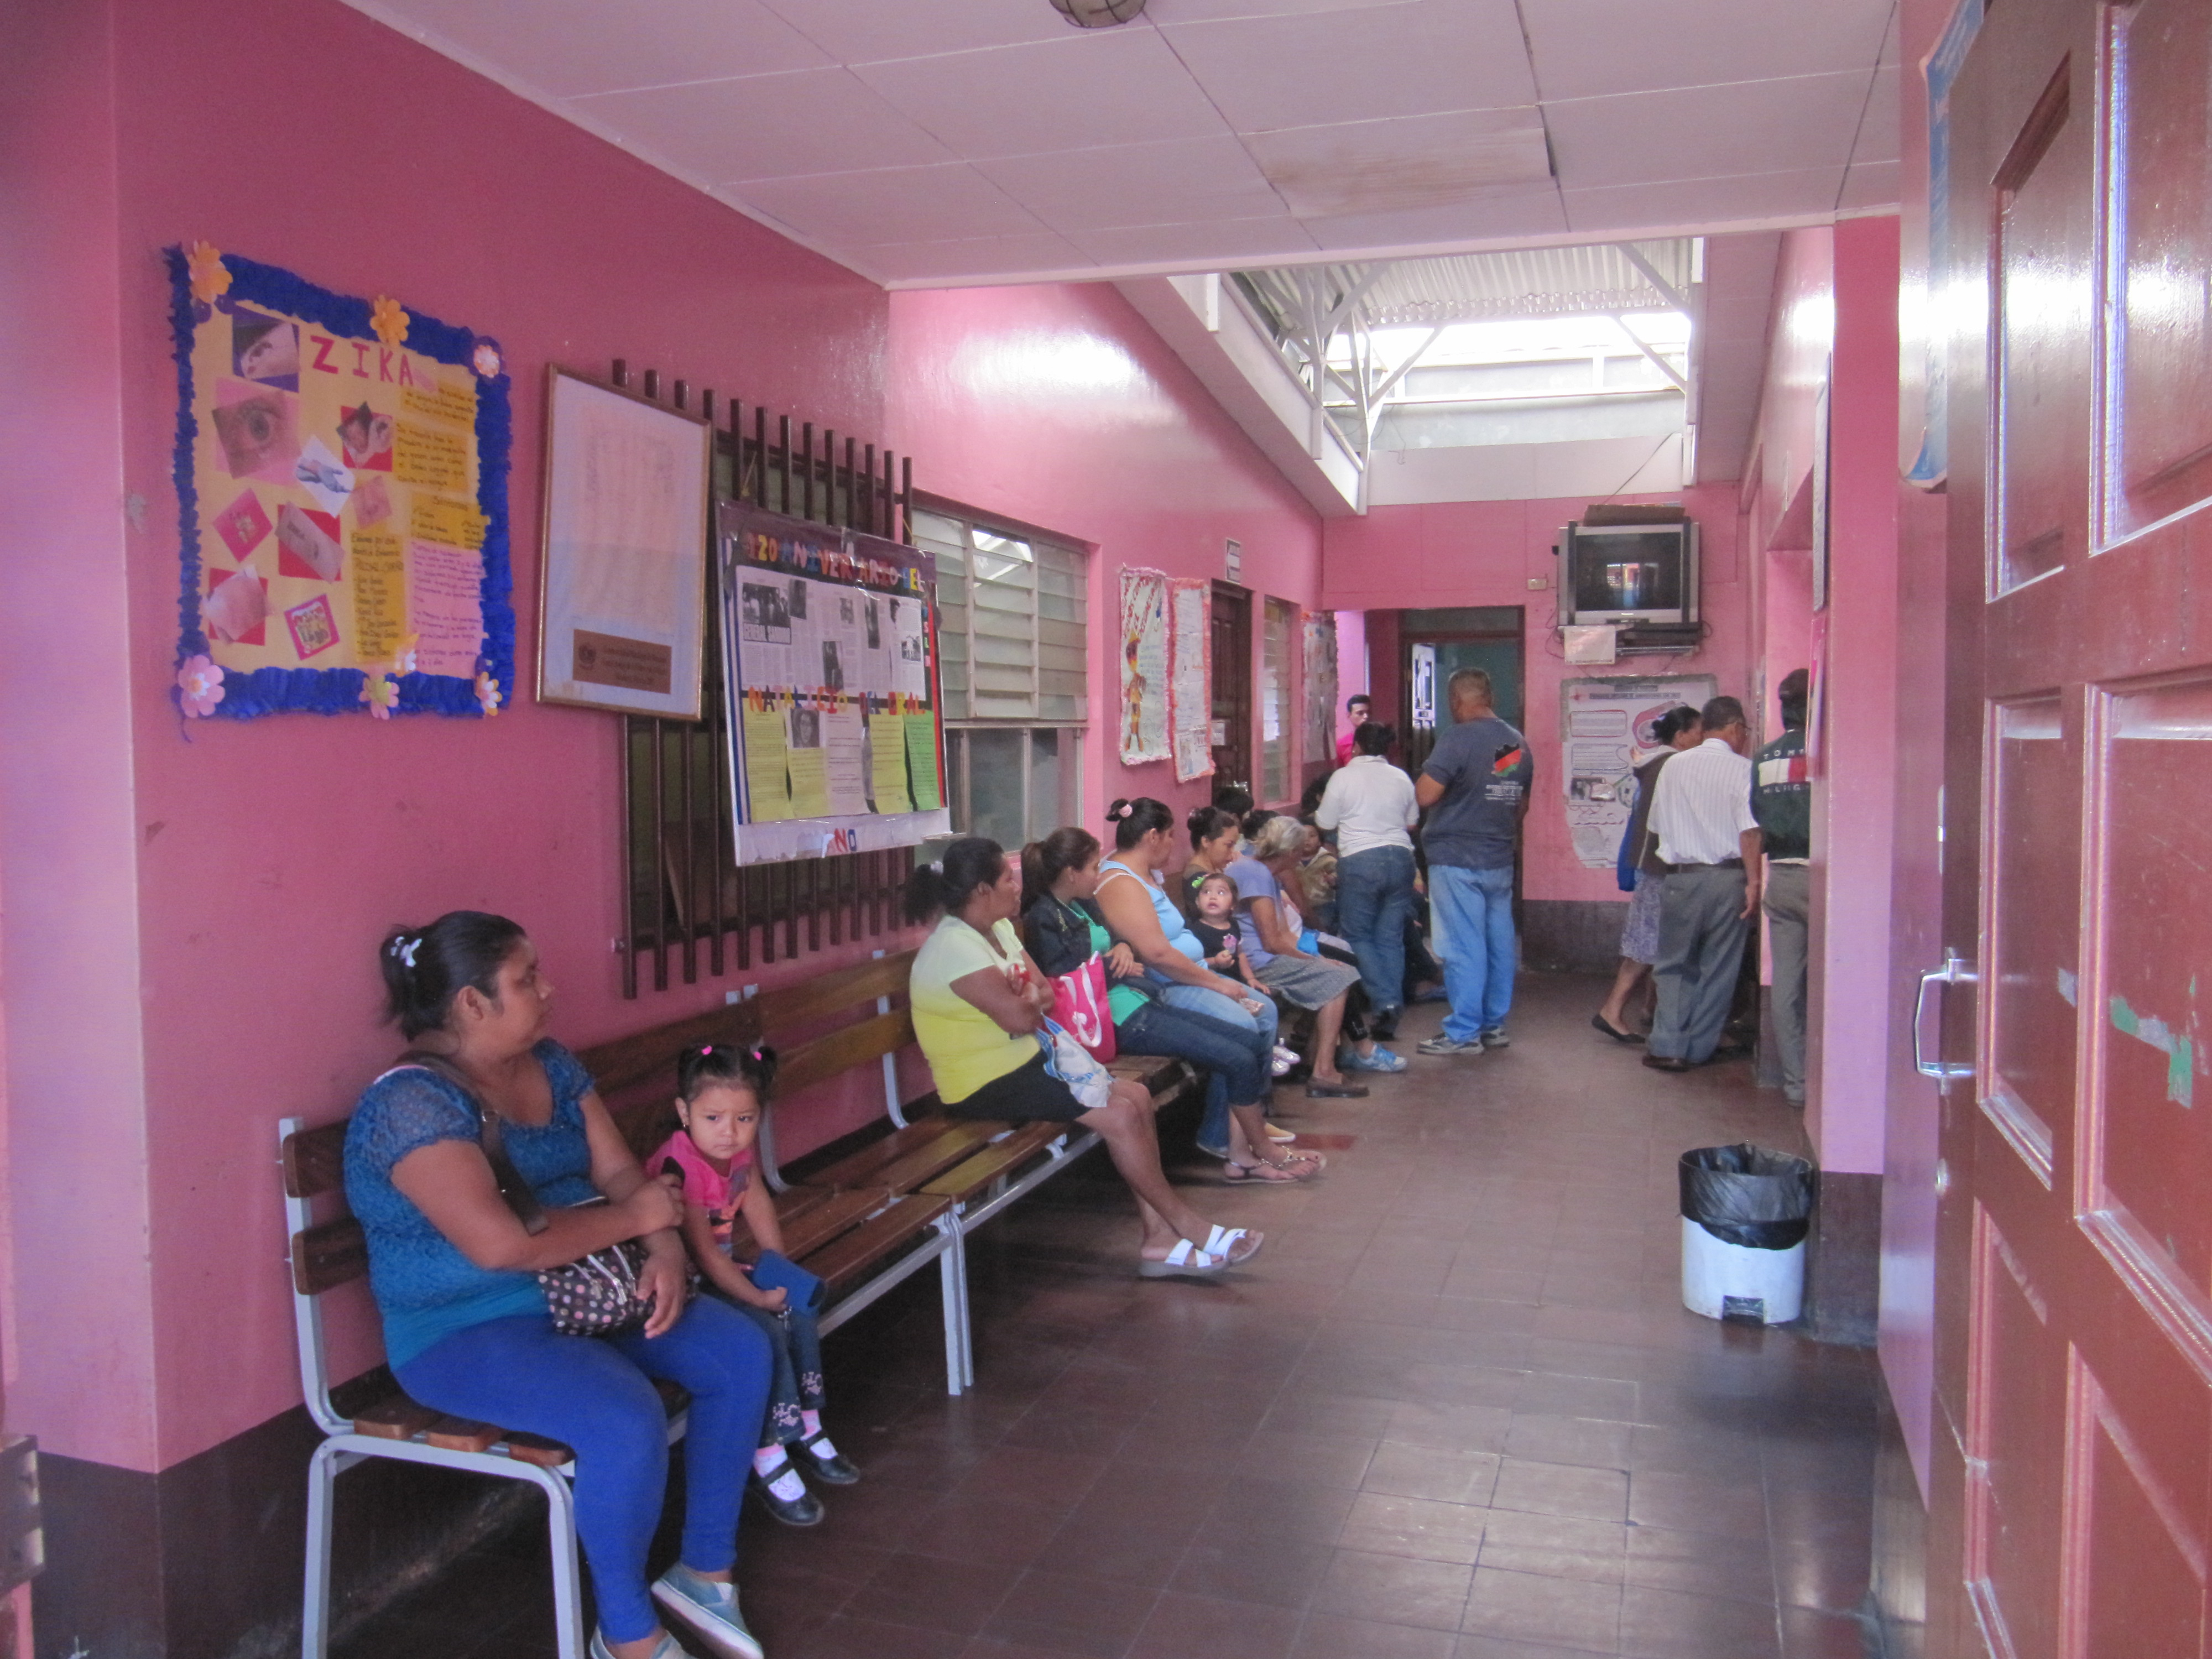 211 Centro de saludIMG_8666